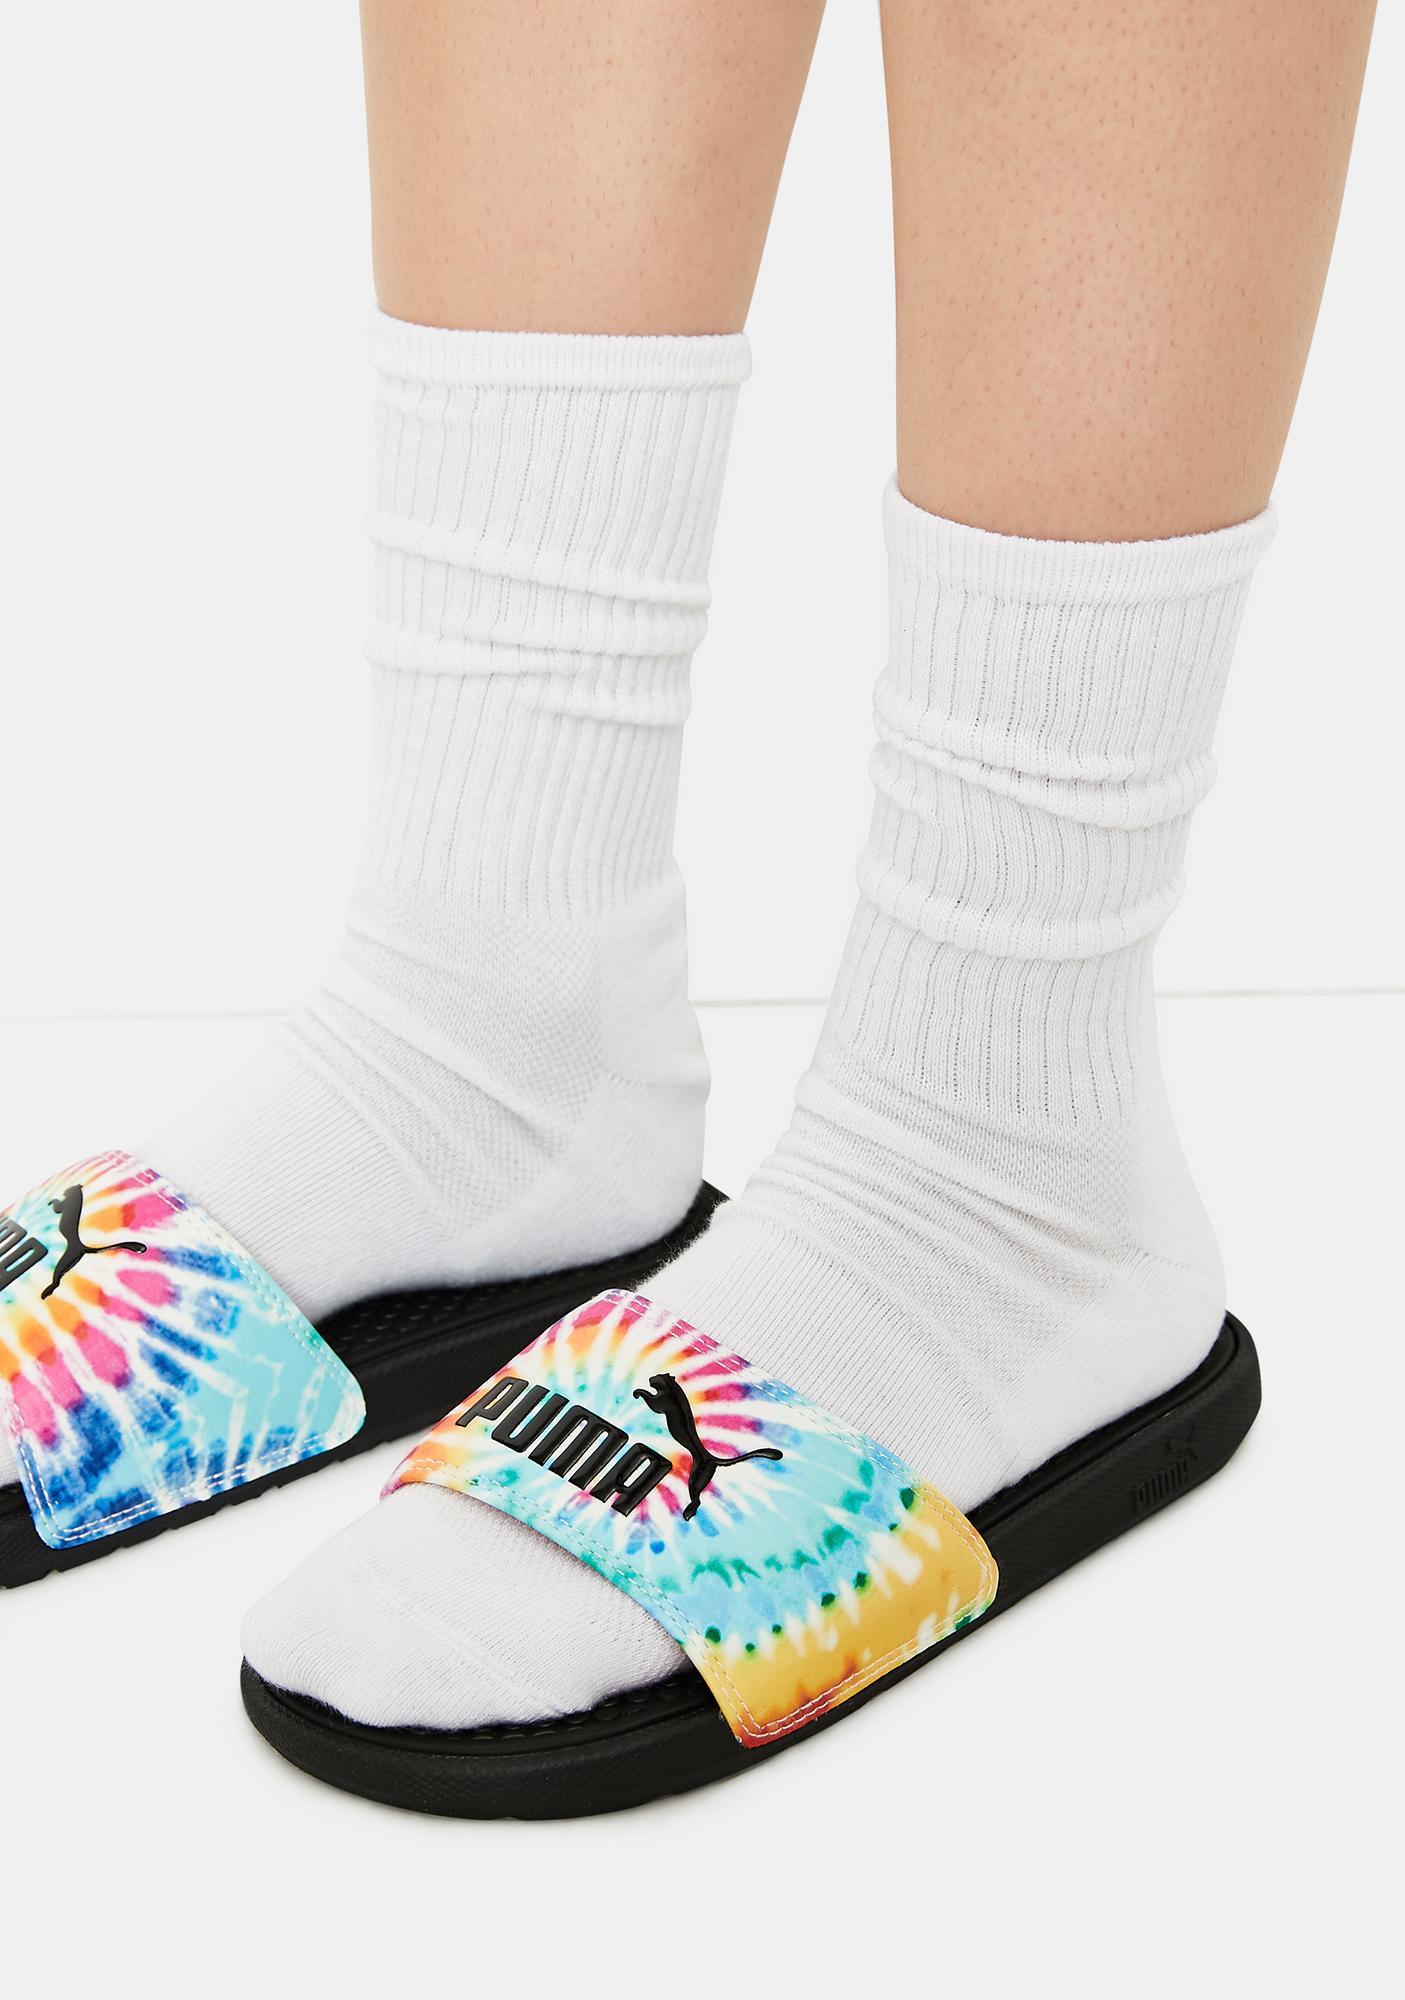 PUMA Tie Dye Cool Cat Women's Slides